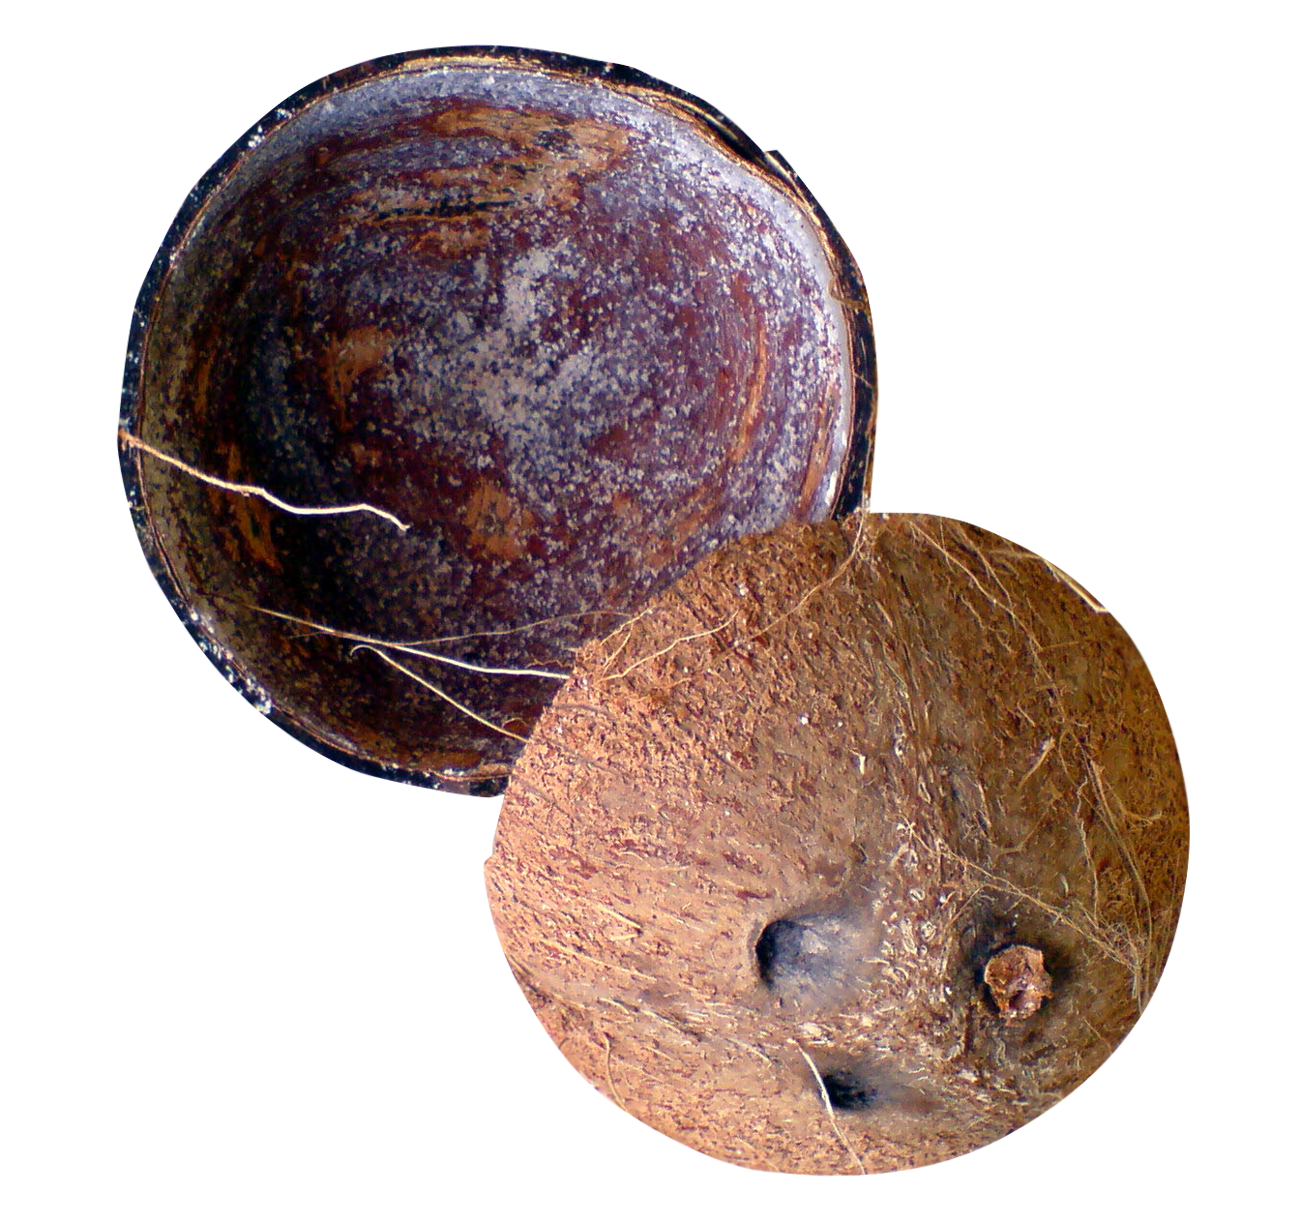 Png images pngpix shell. Coconut clipart coconut husk